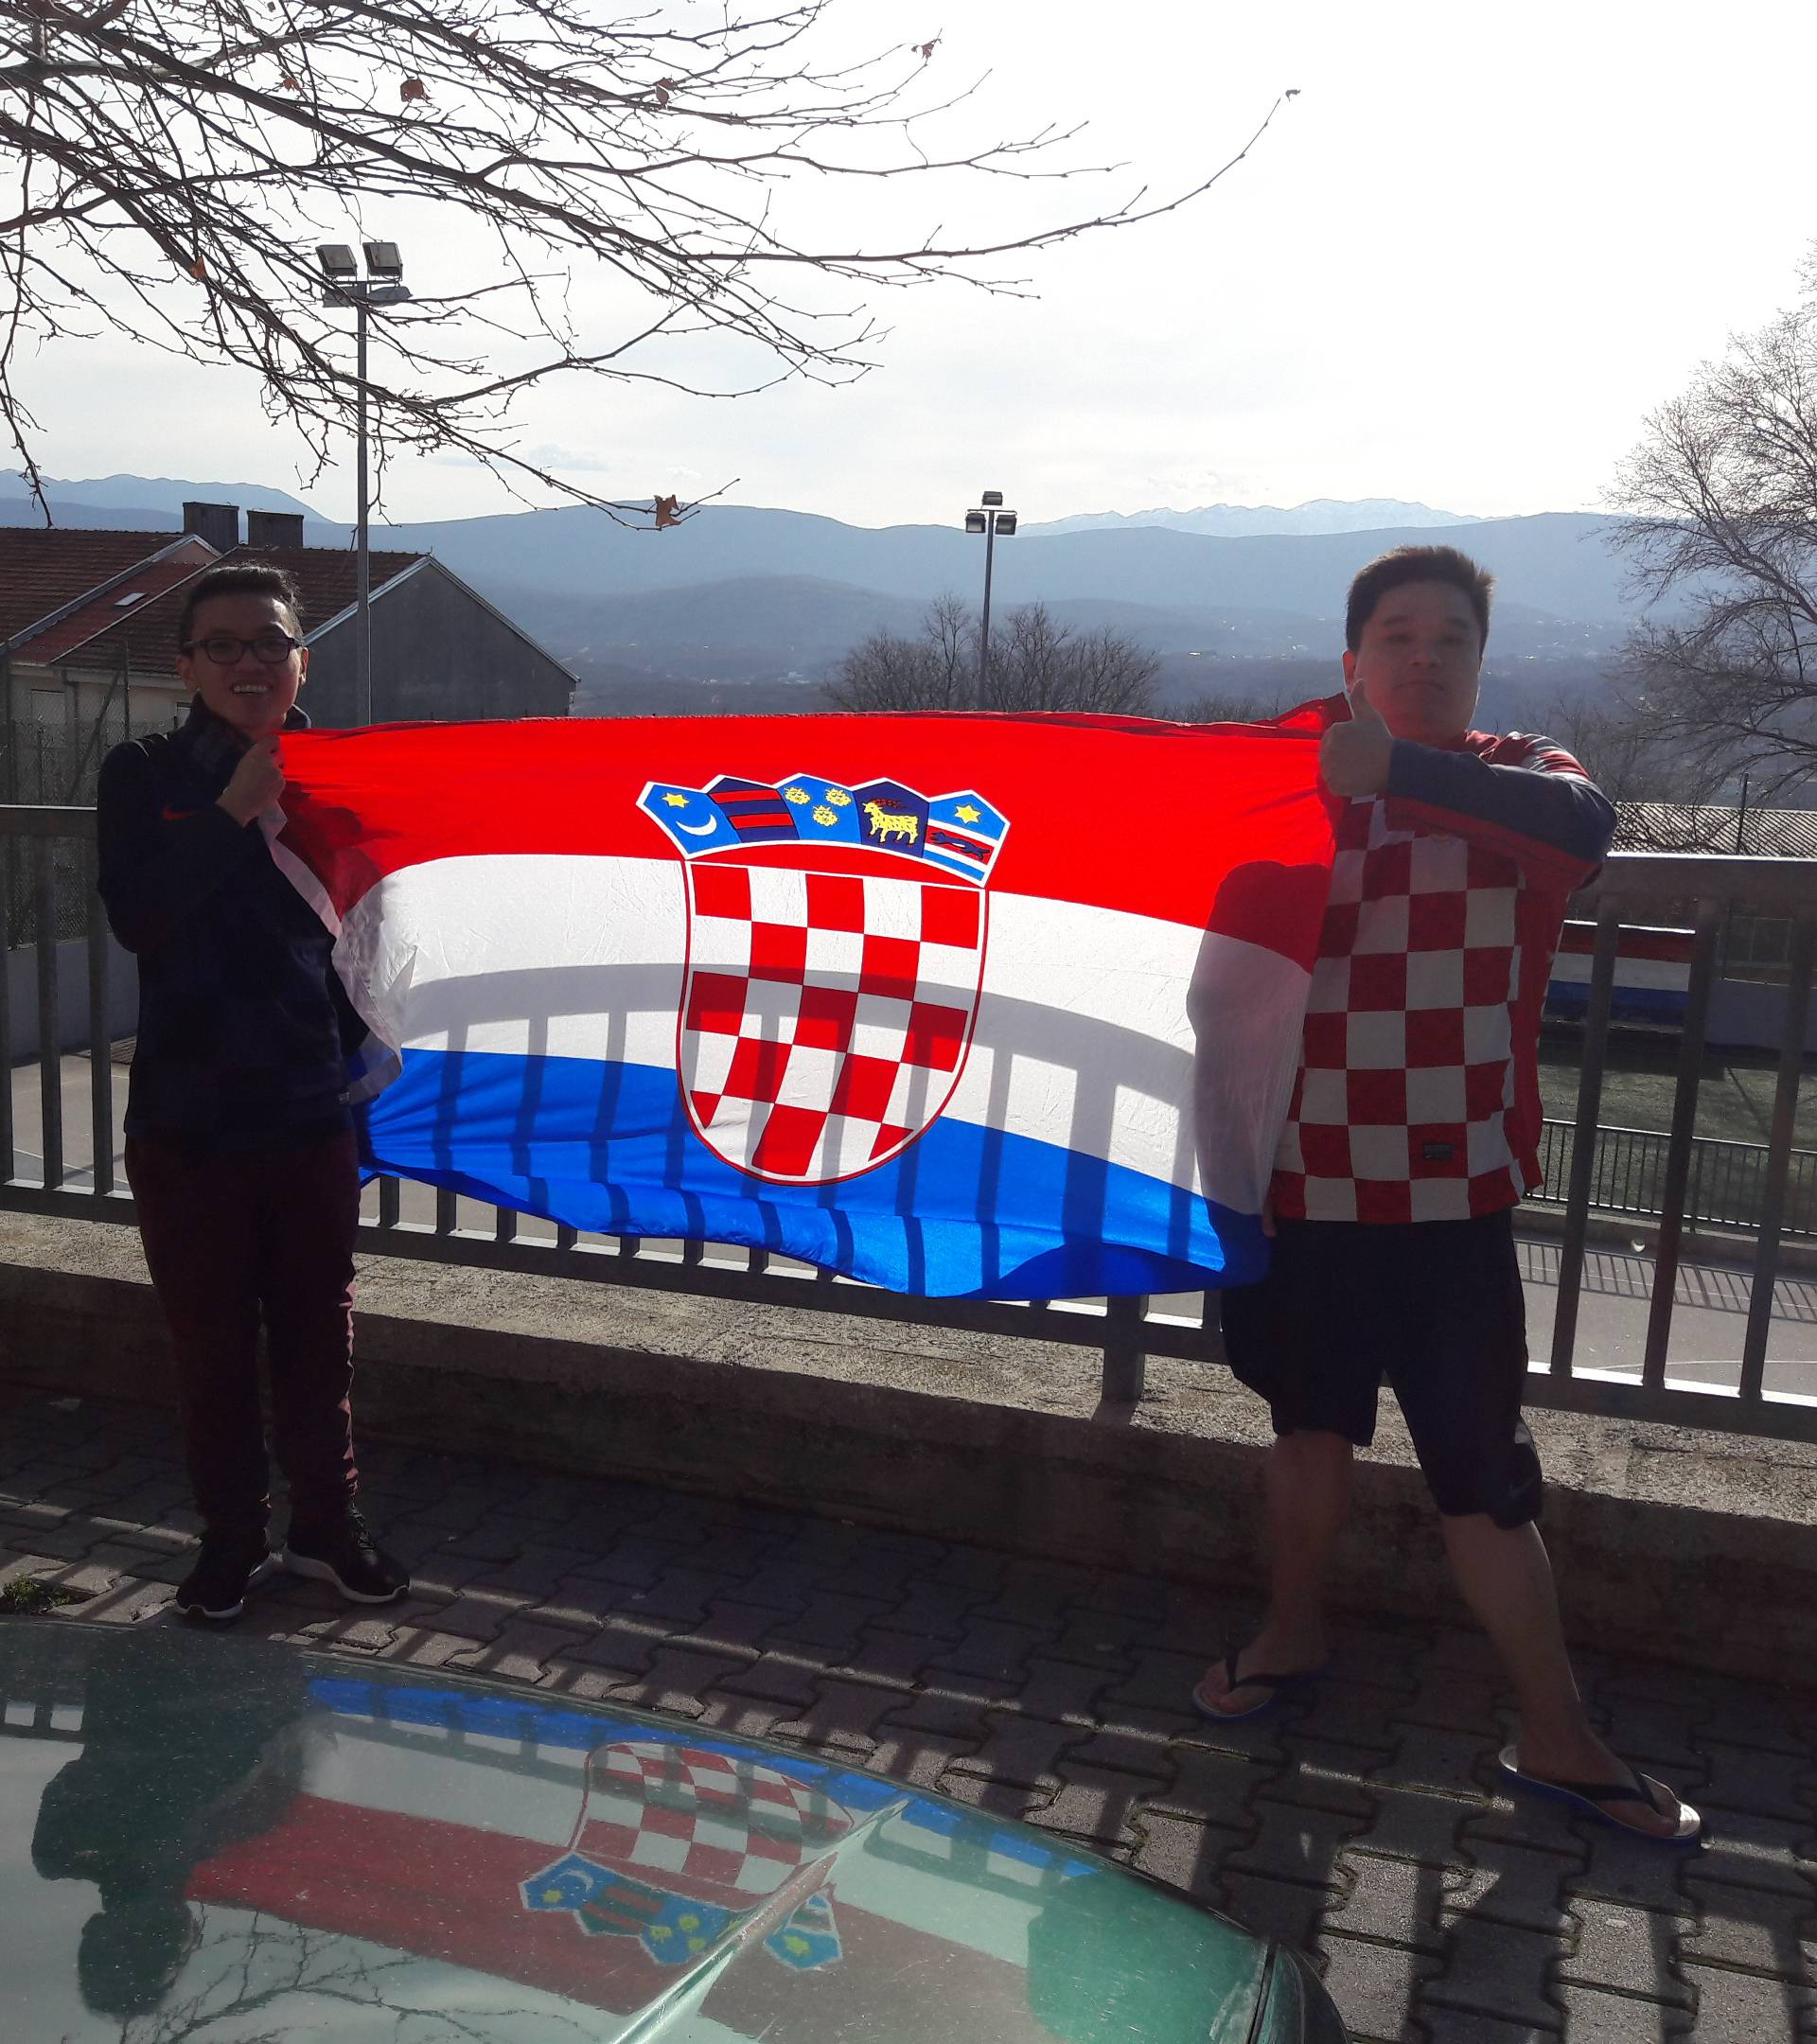 Paradiraju po Imotskom: Kinezi Damir i Niko žele biti - Hrvati!